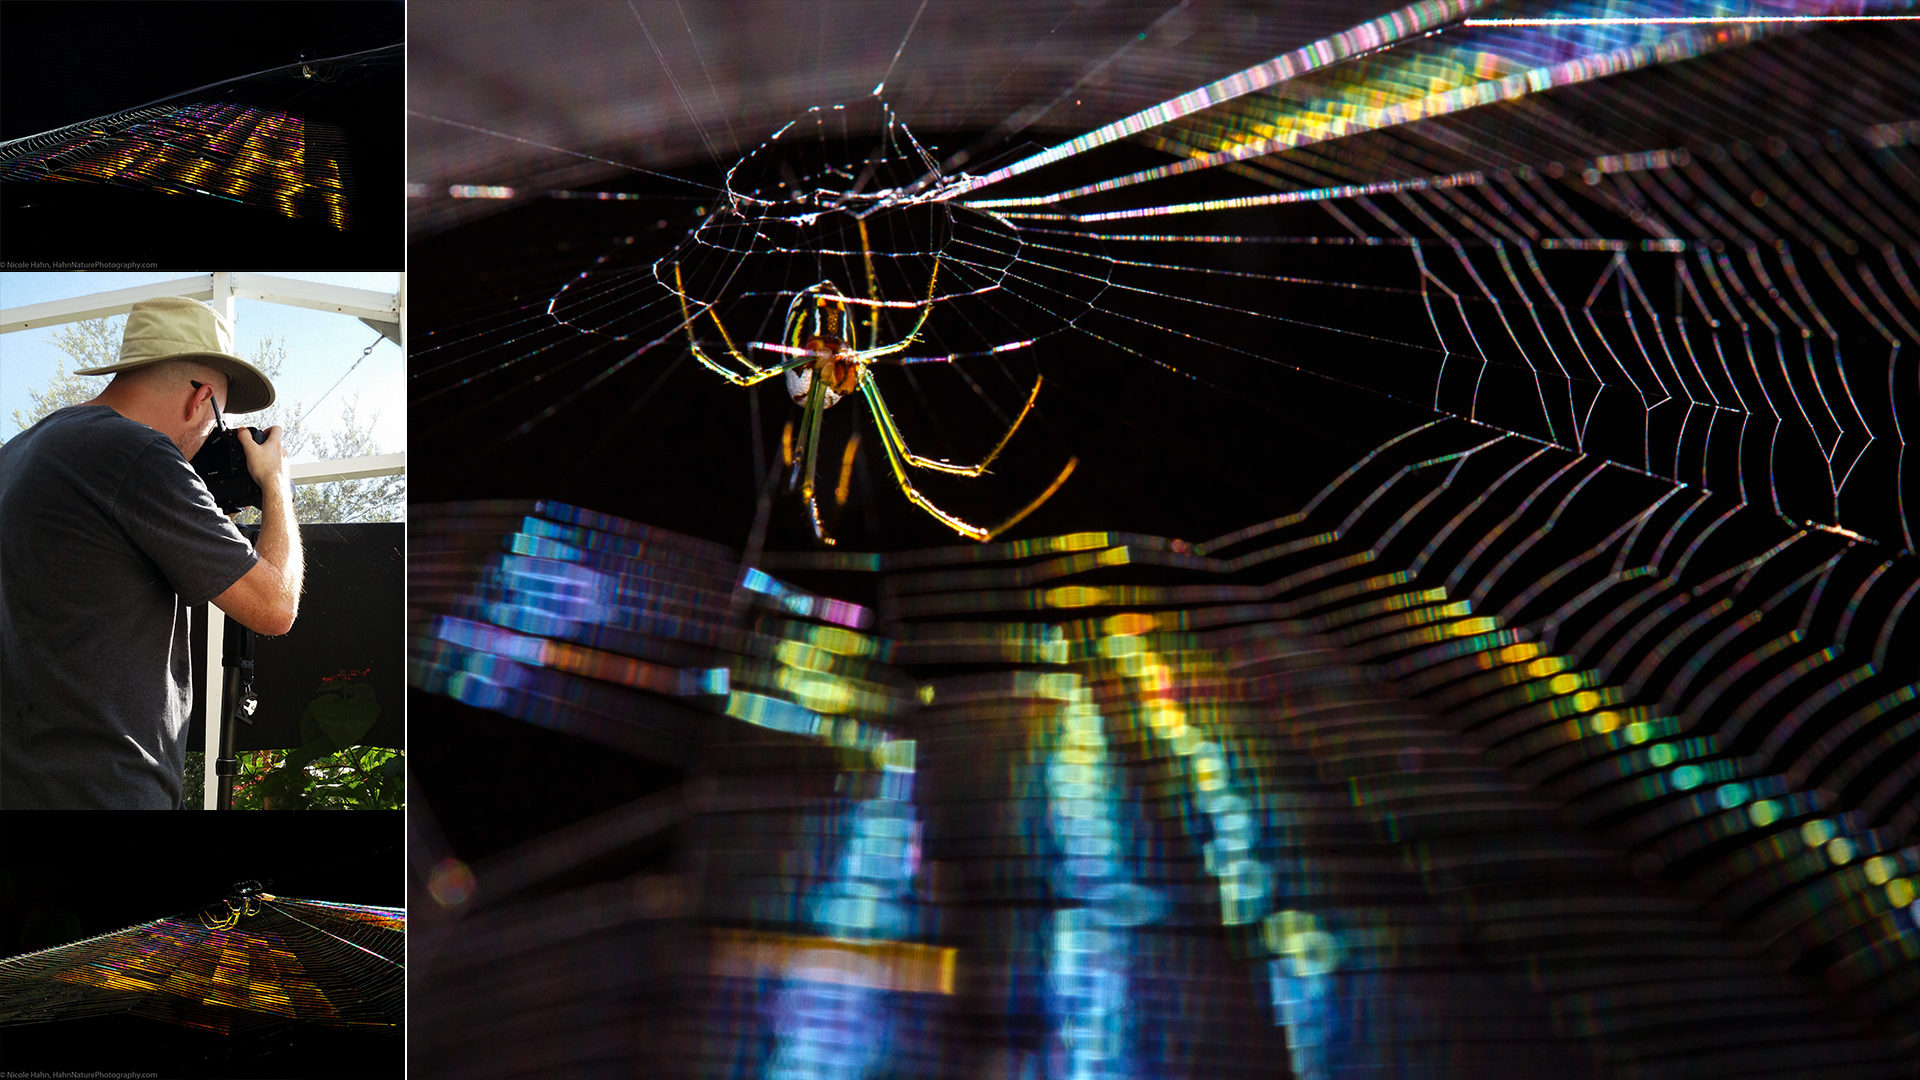 FEATURED-jhahn-rai-the-spider